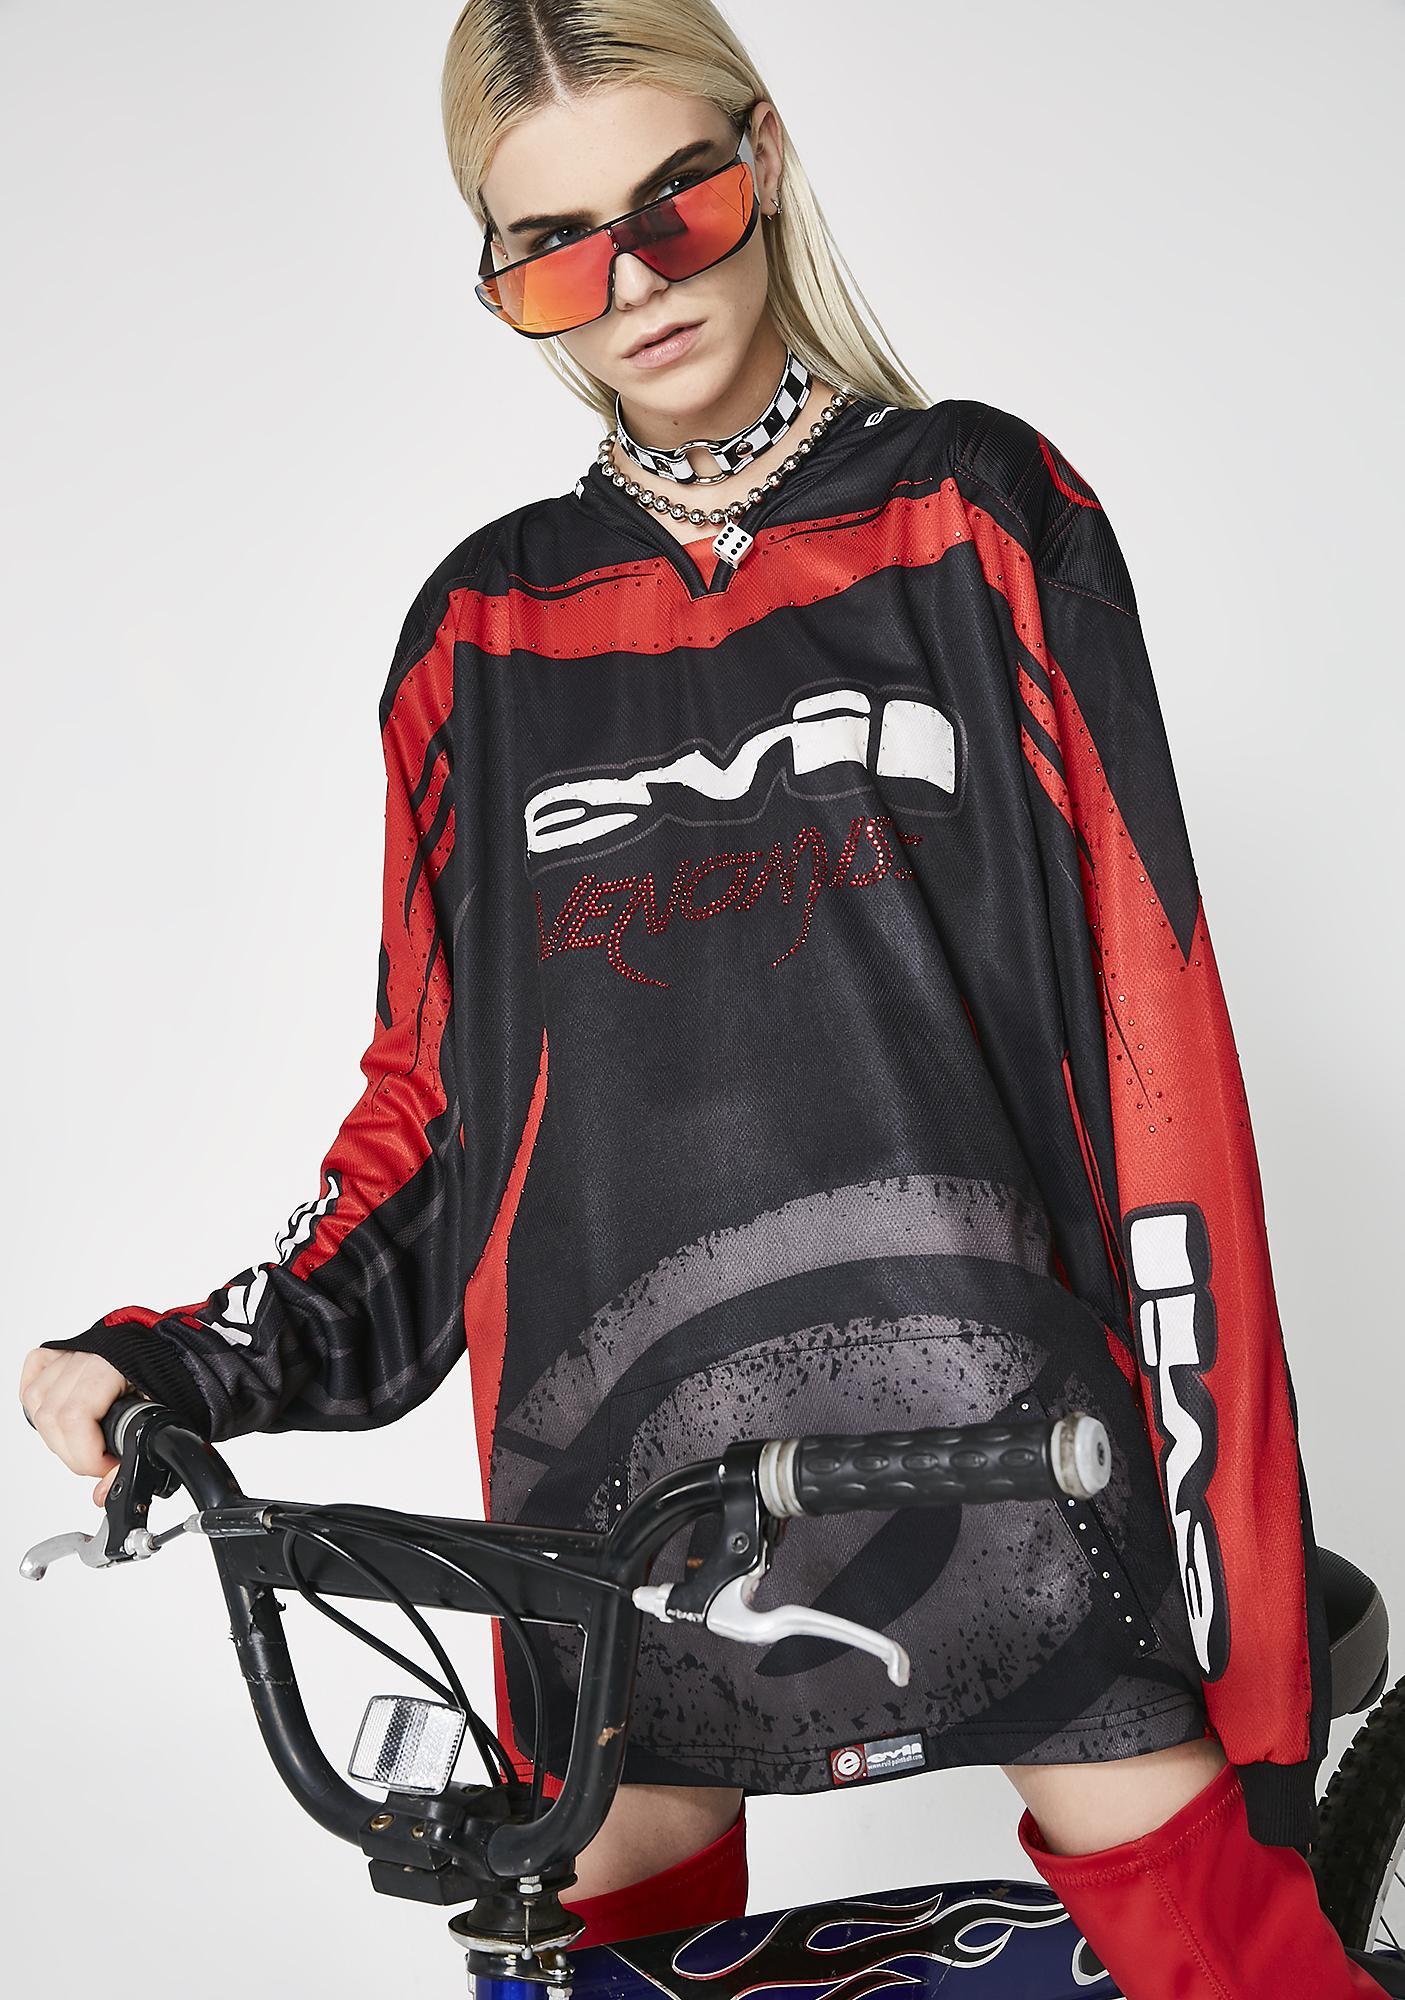 Venomiss NYC X BABEMANIA Western Moto Long Sleeve Tee